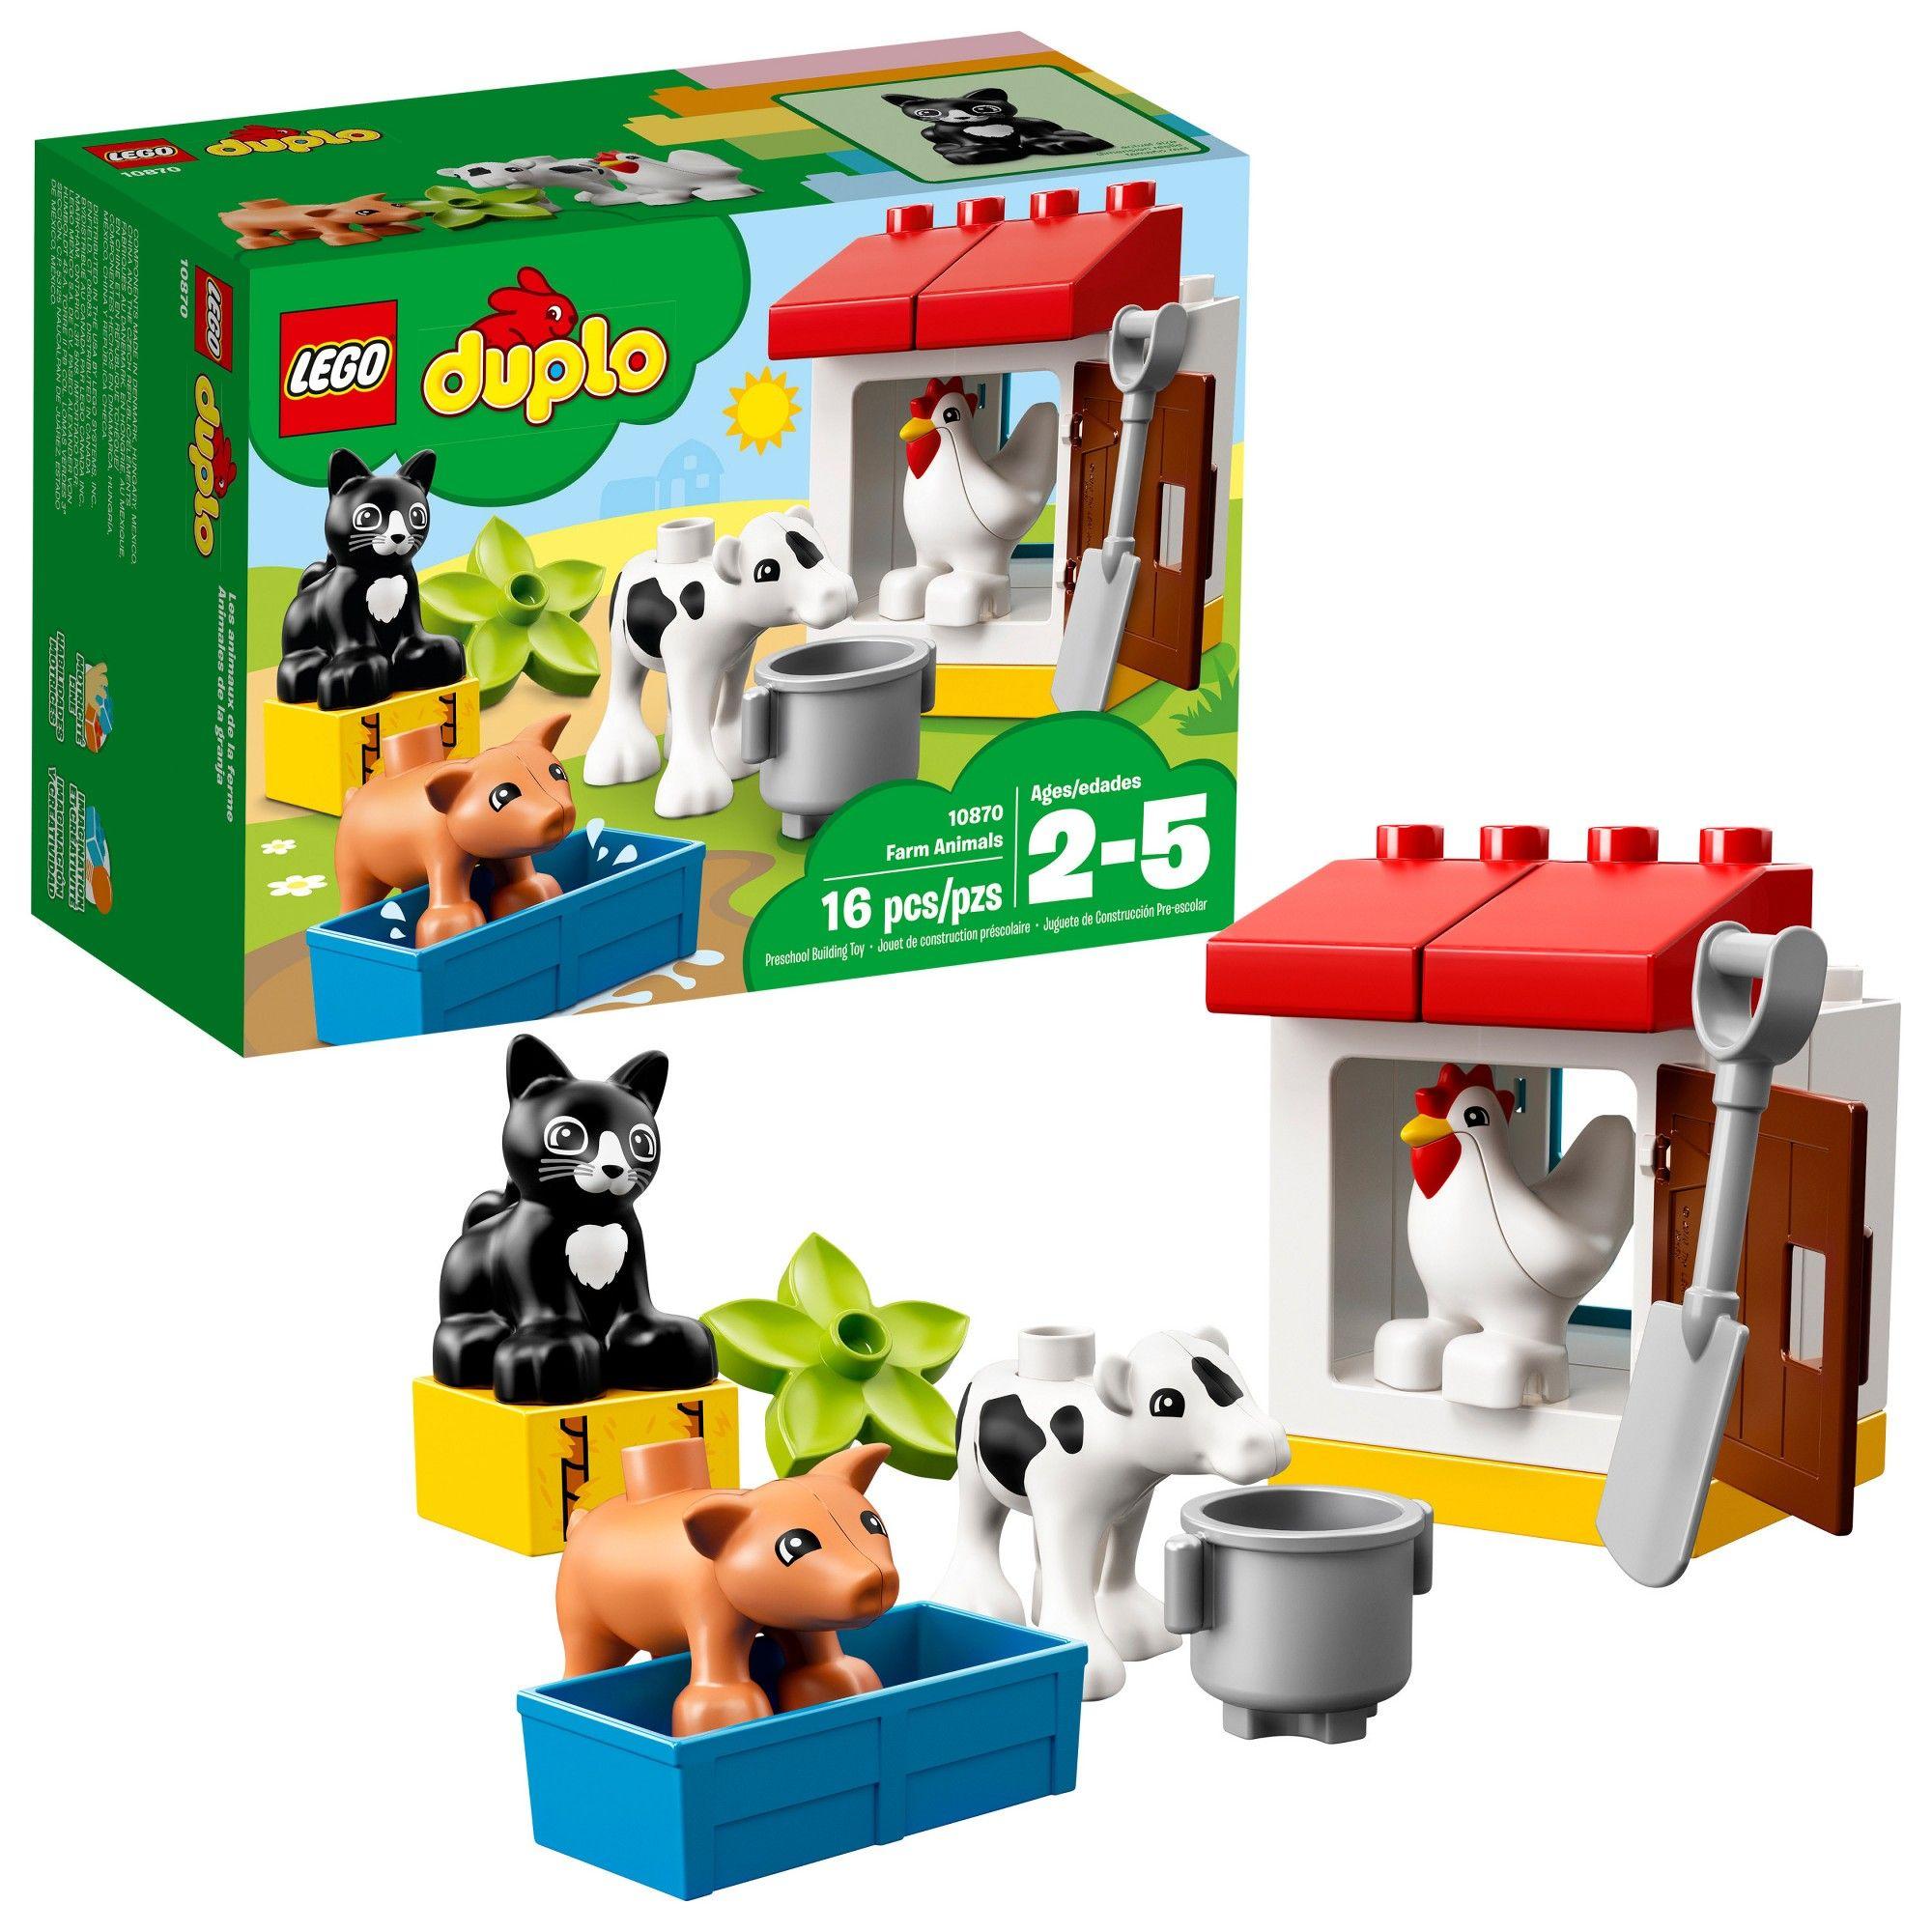 Lego Duplo Town Farm Animals 10870 Products Pinterest Lego